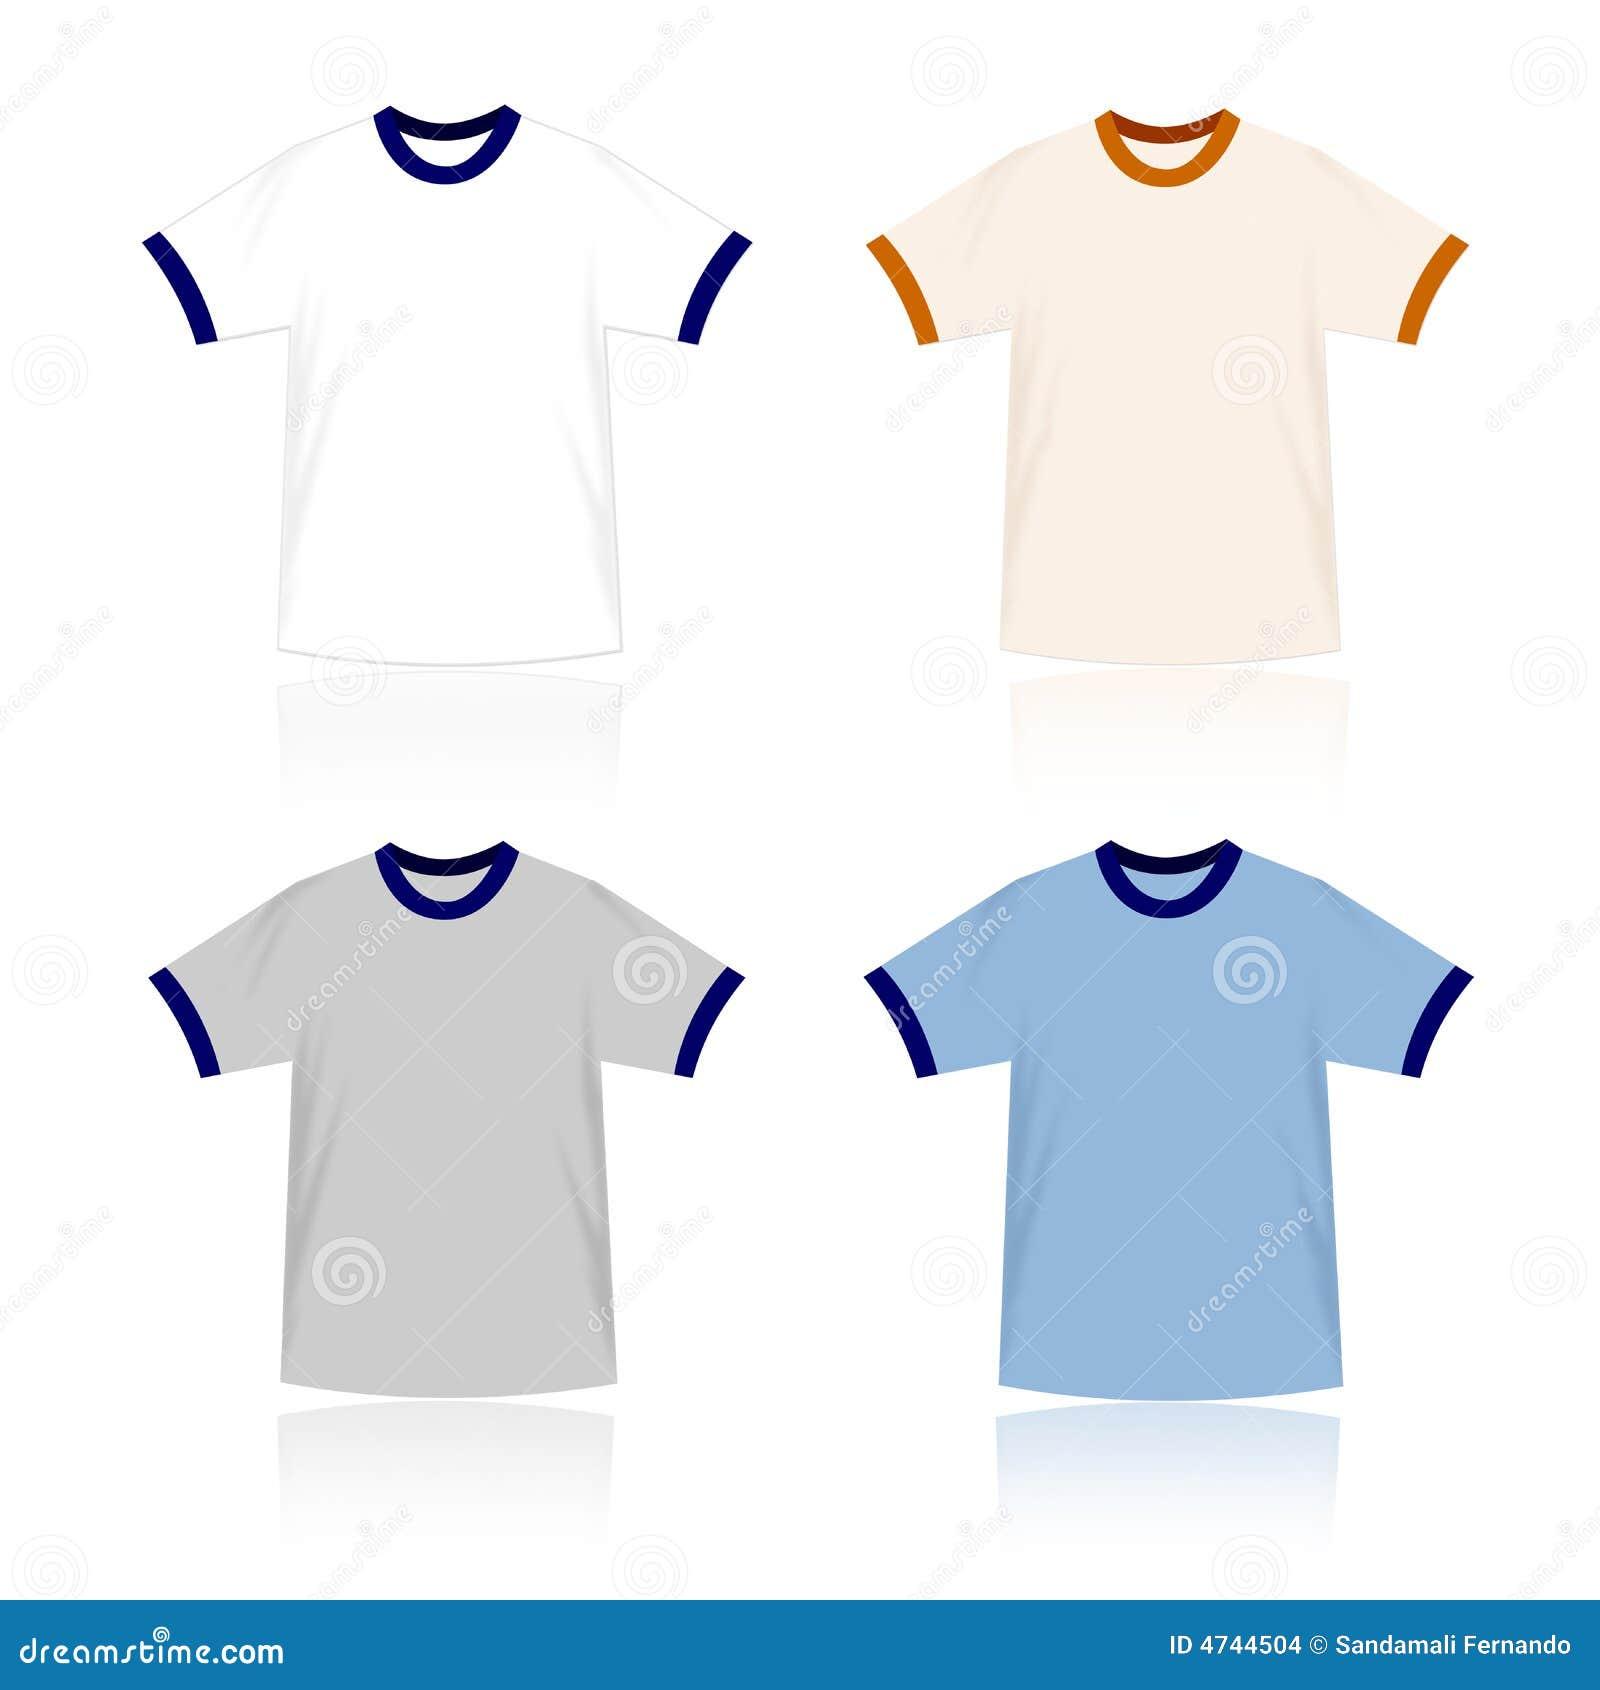 ringer t shirts blank templates stock vector image 4744504. Black Bedroom Furniture Sets. Home Design Ideas